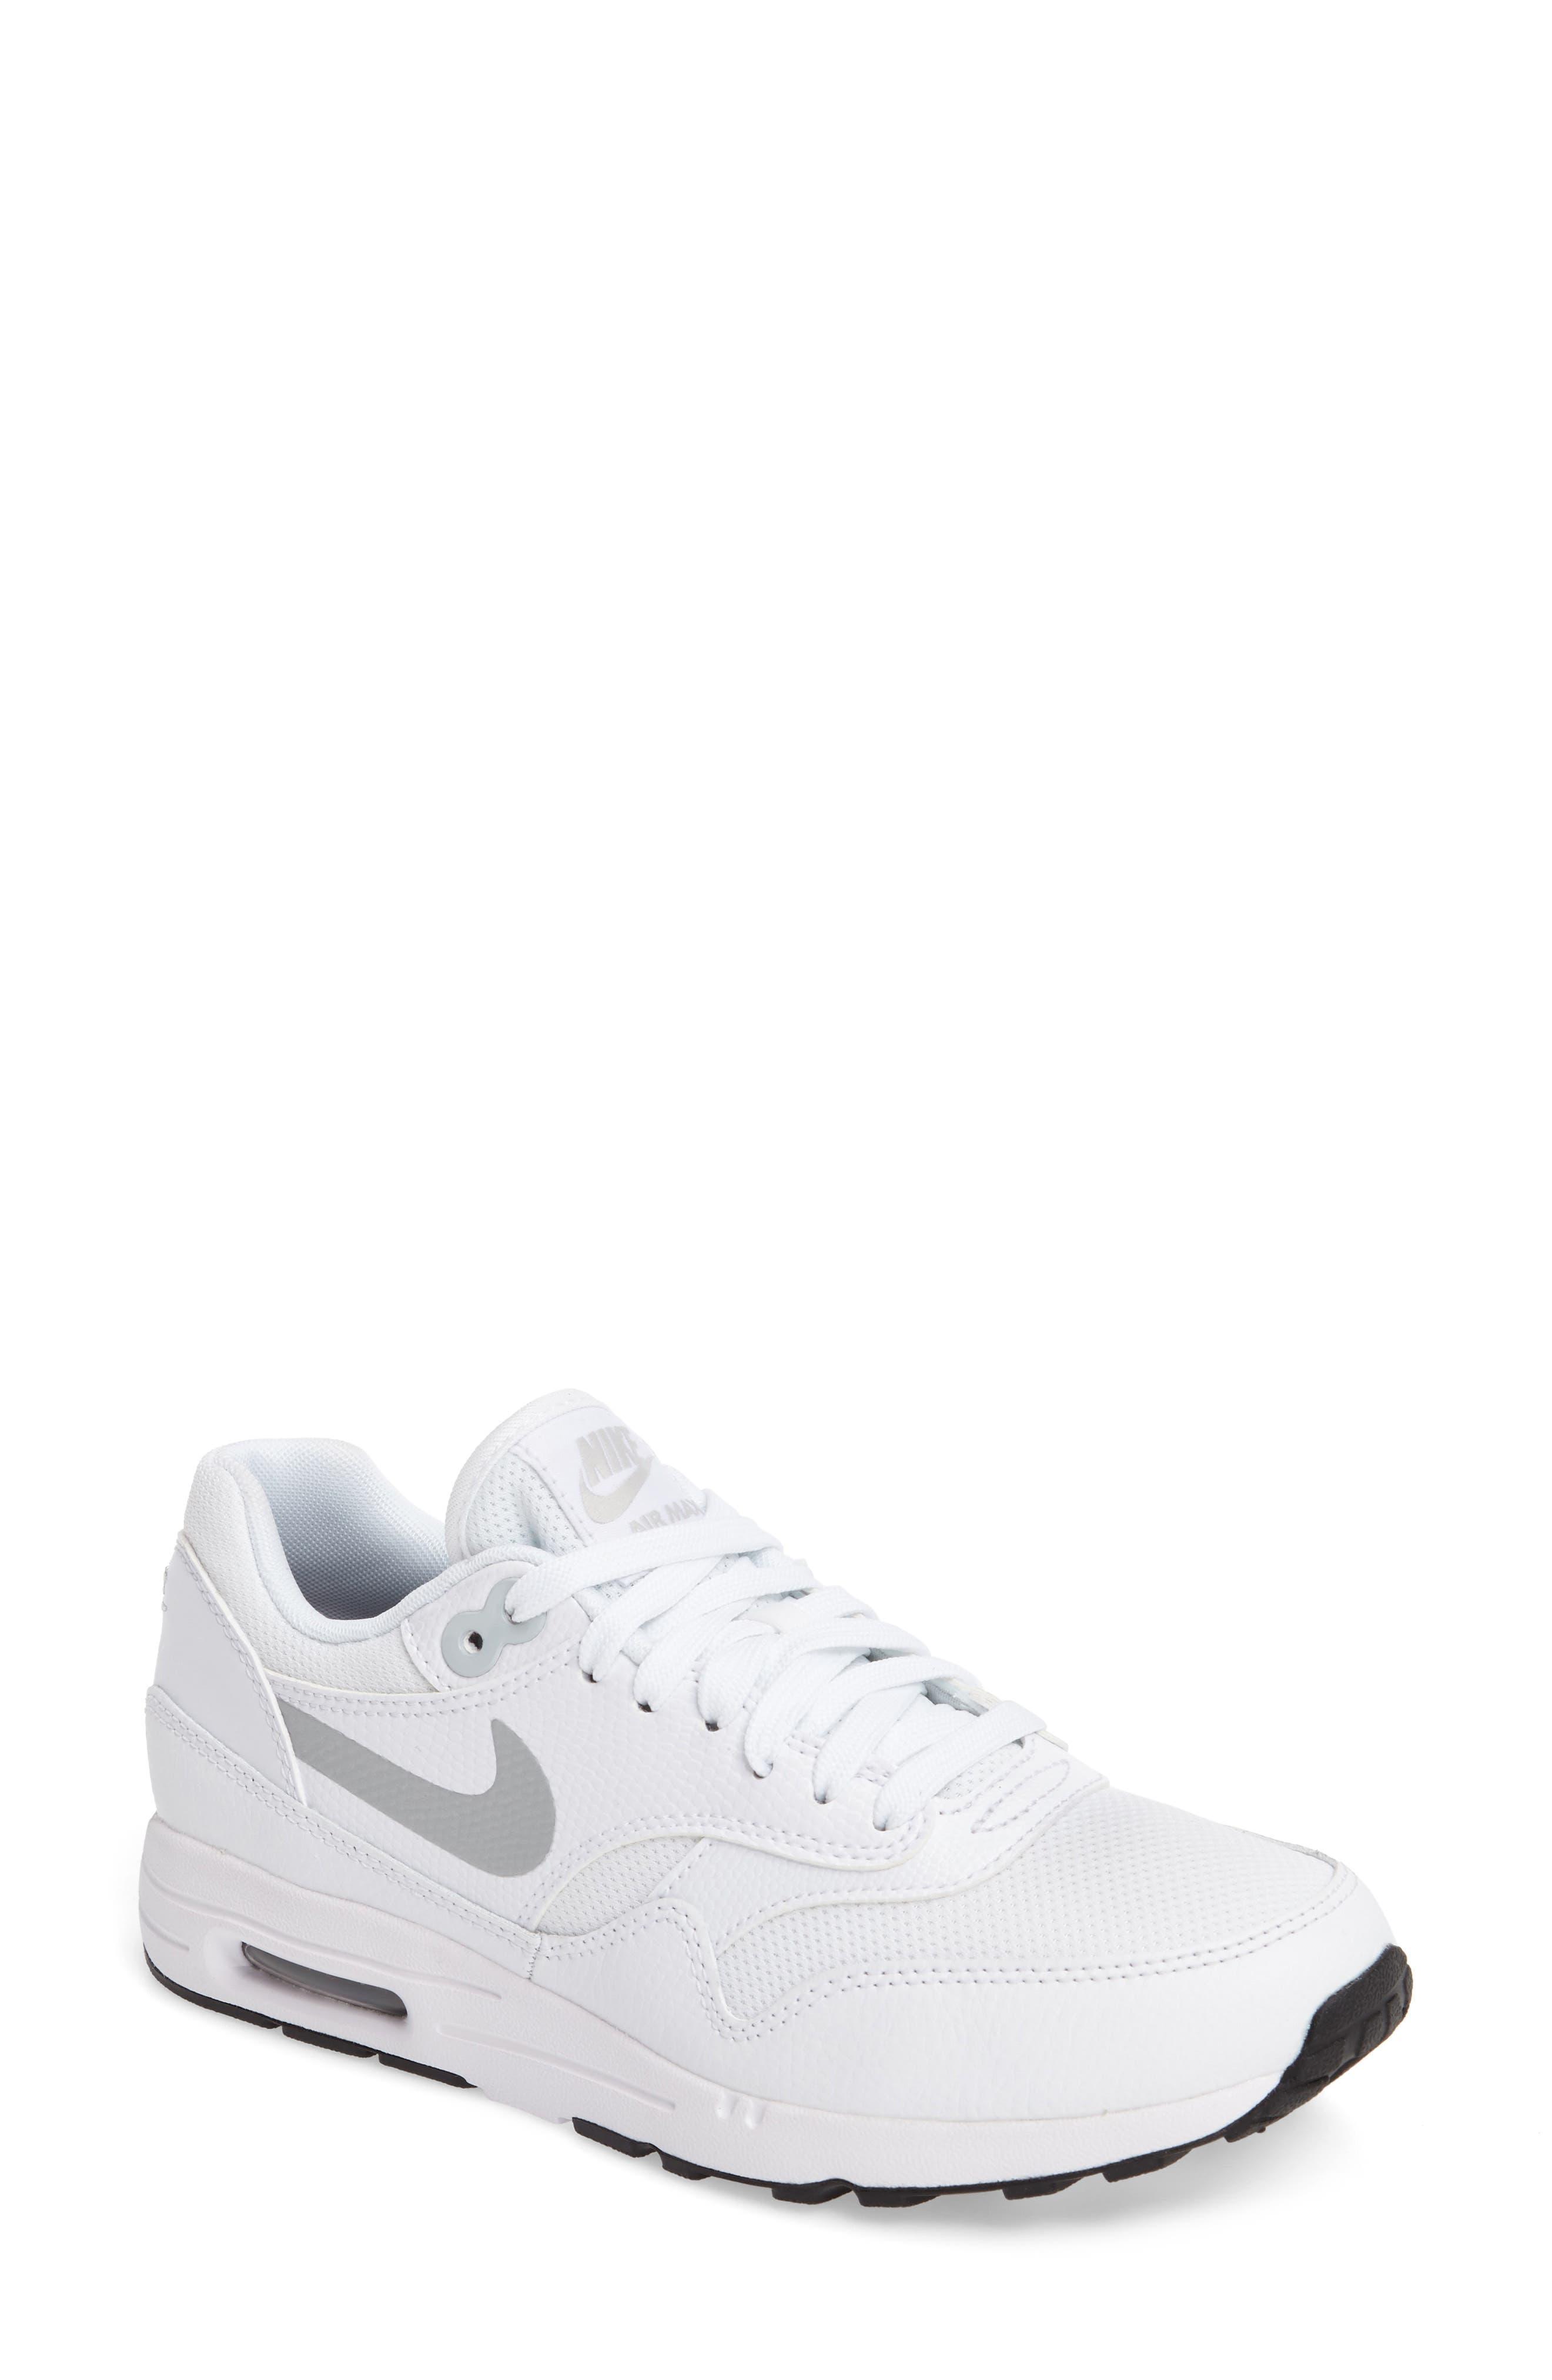 Air Max 1 Ultra 2.0 Running Shoe,                             Main thumbnail 1, color,                             White/ Platinum/ Black/ White